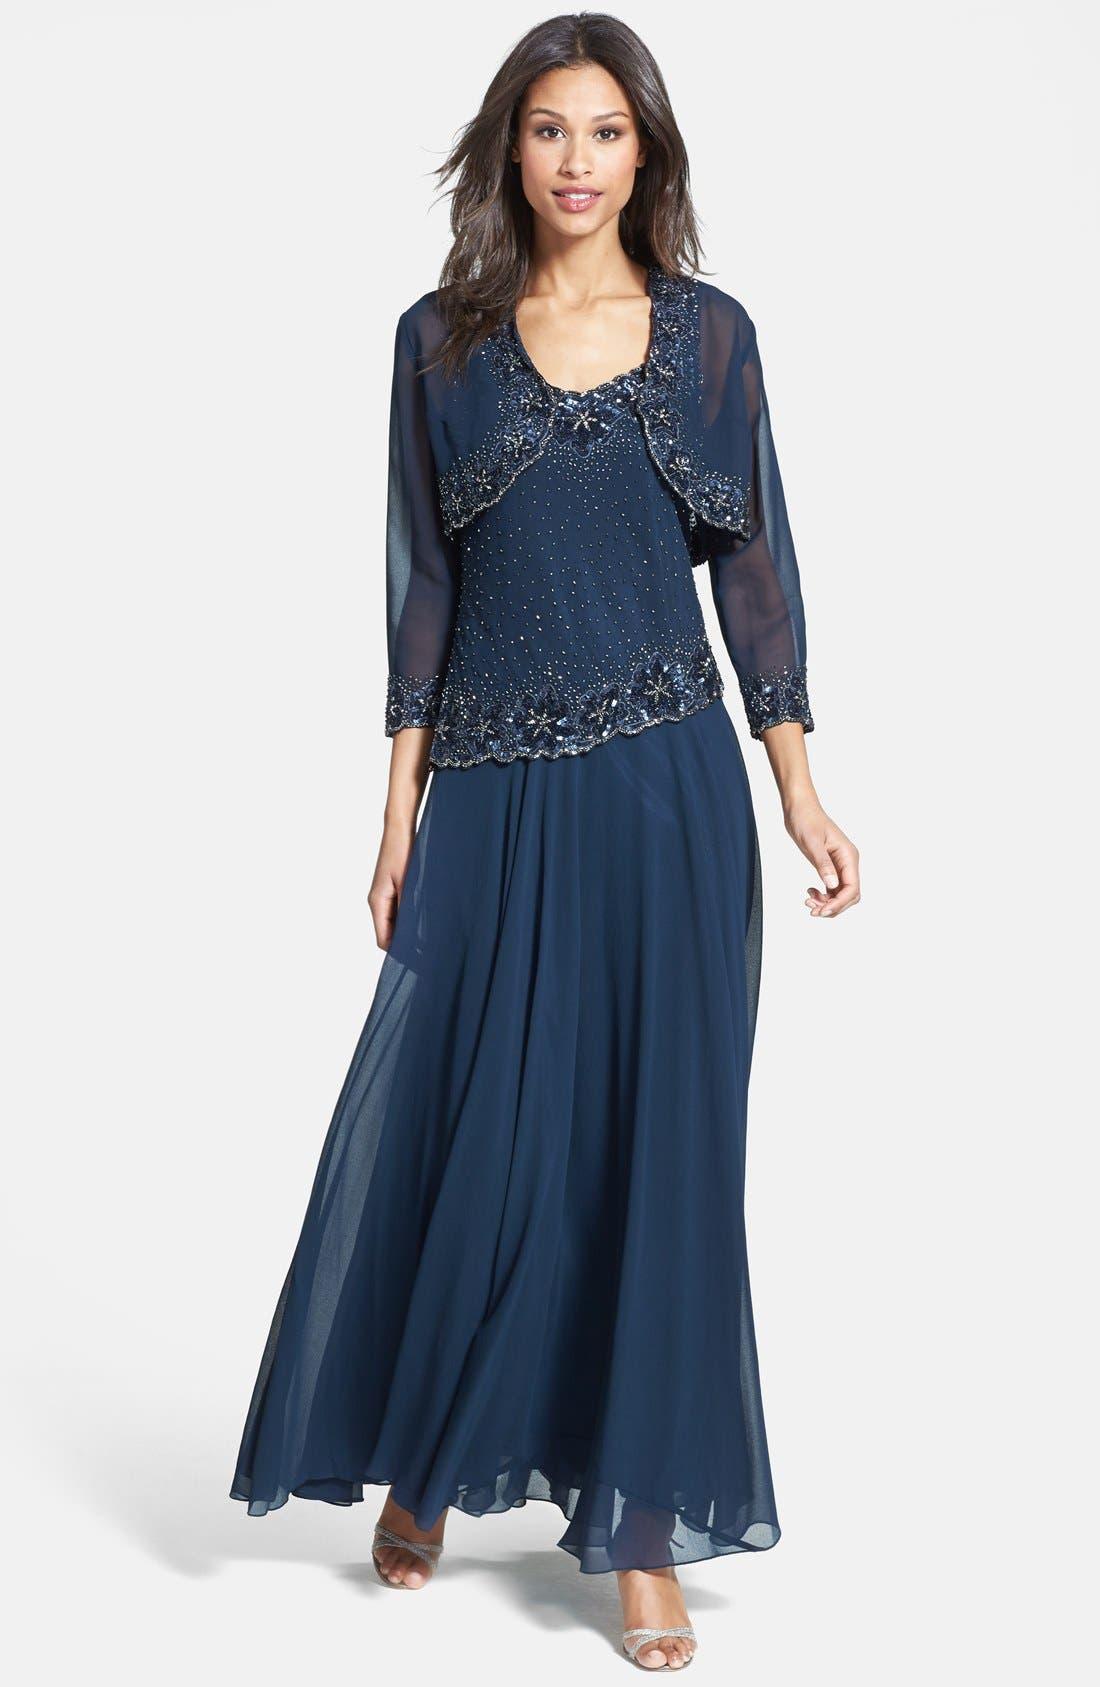 Alternate Image 1 Selected - J Kara Embellished Chiffon Dress & Bolero